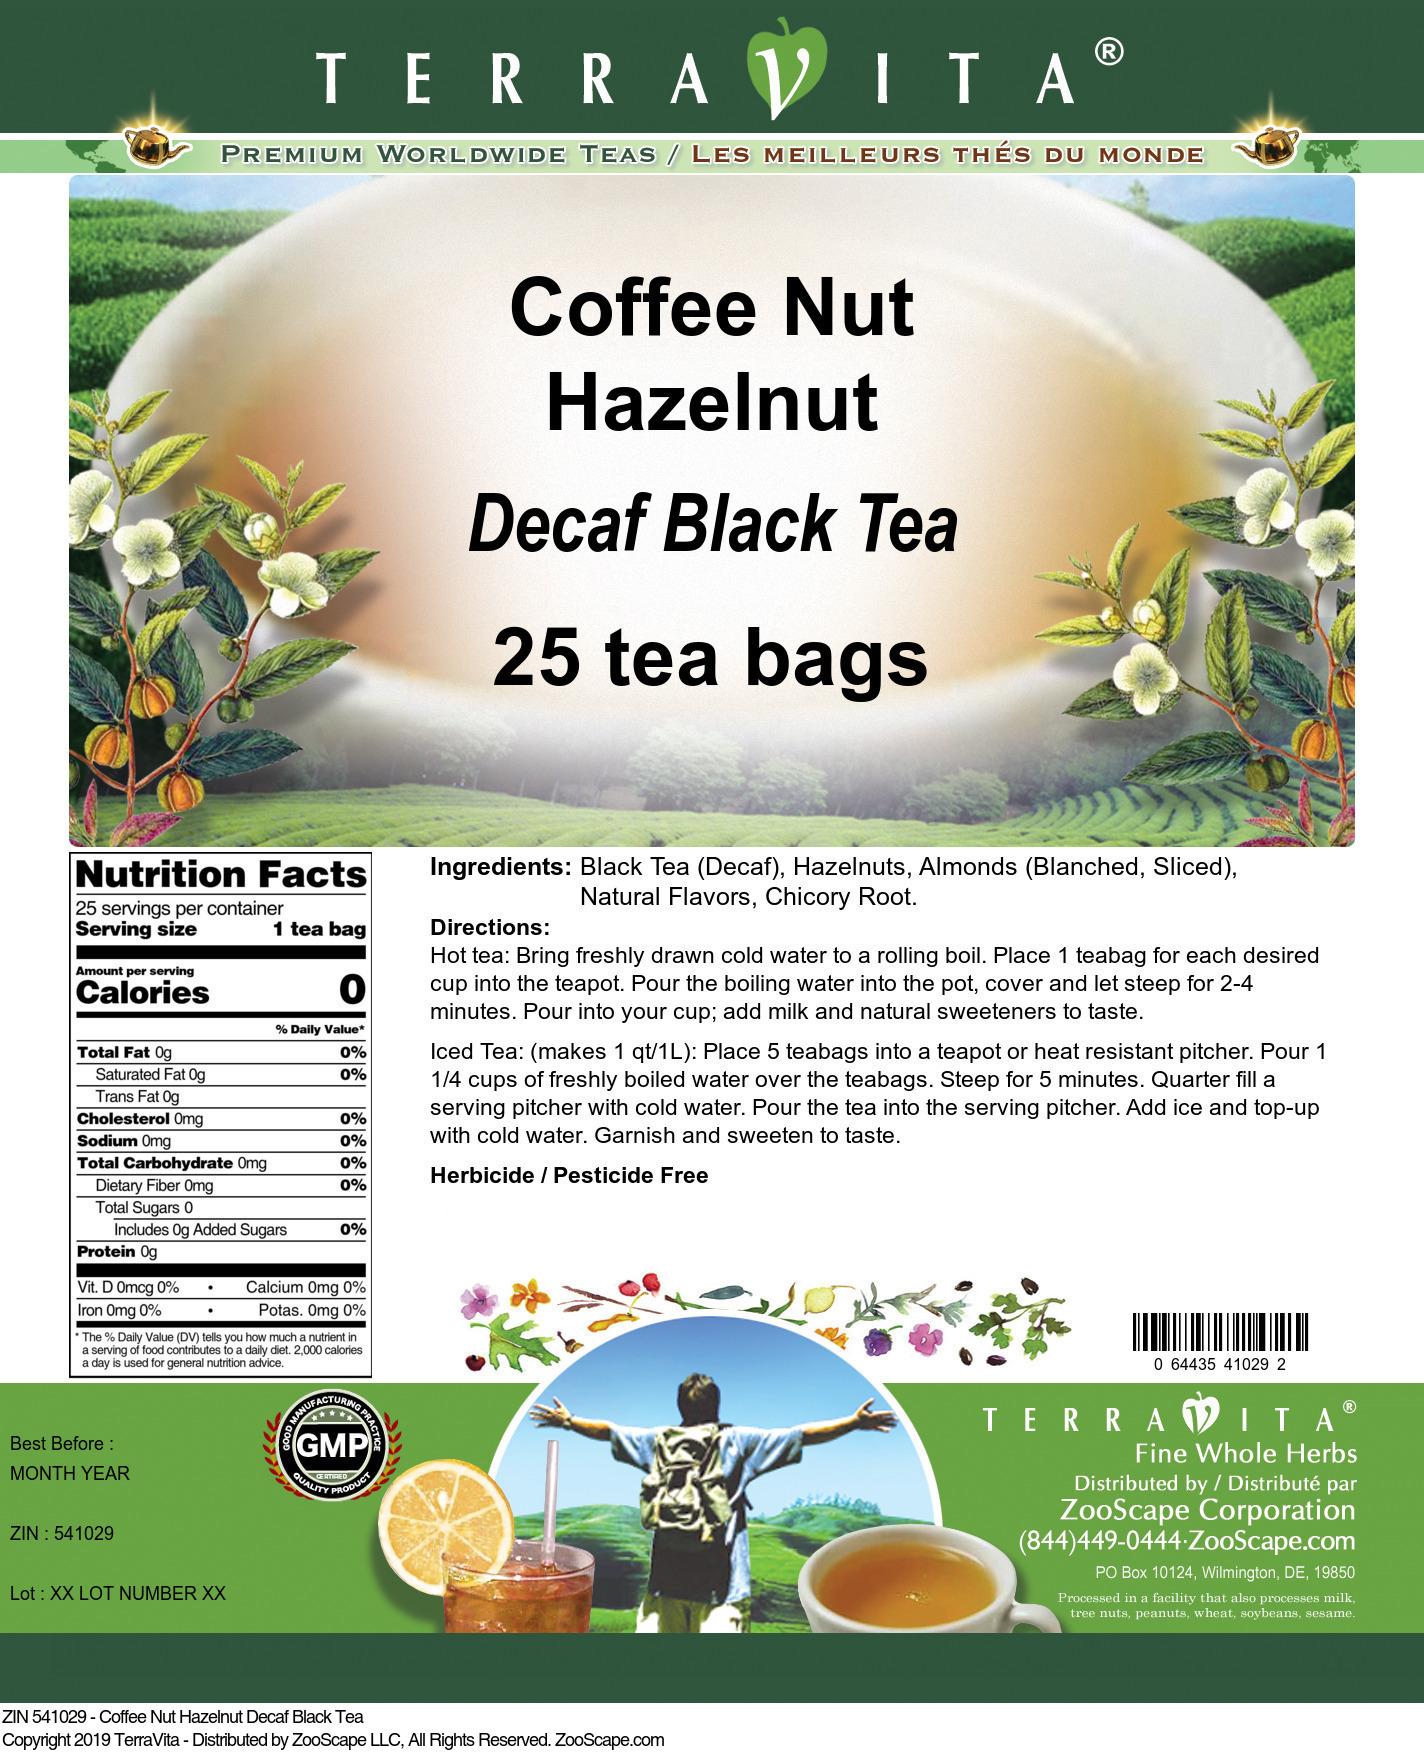 Coffee Nut Hazelnut Decaf Black Tea